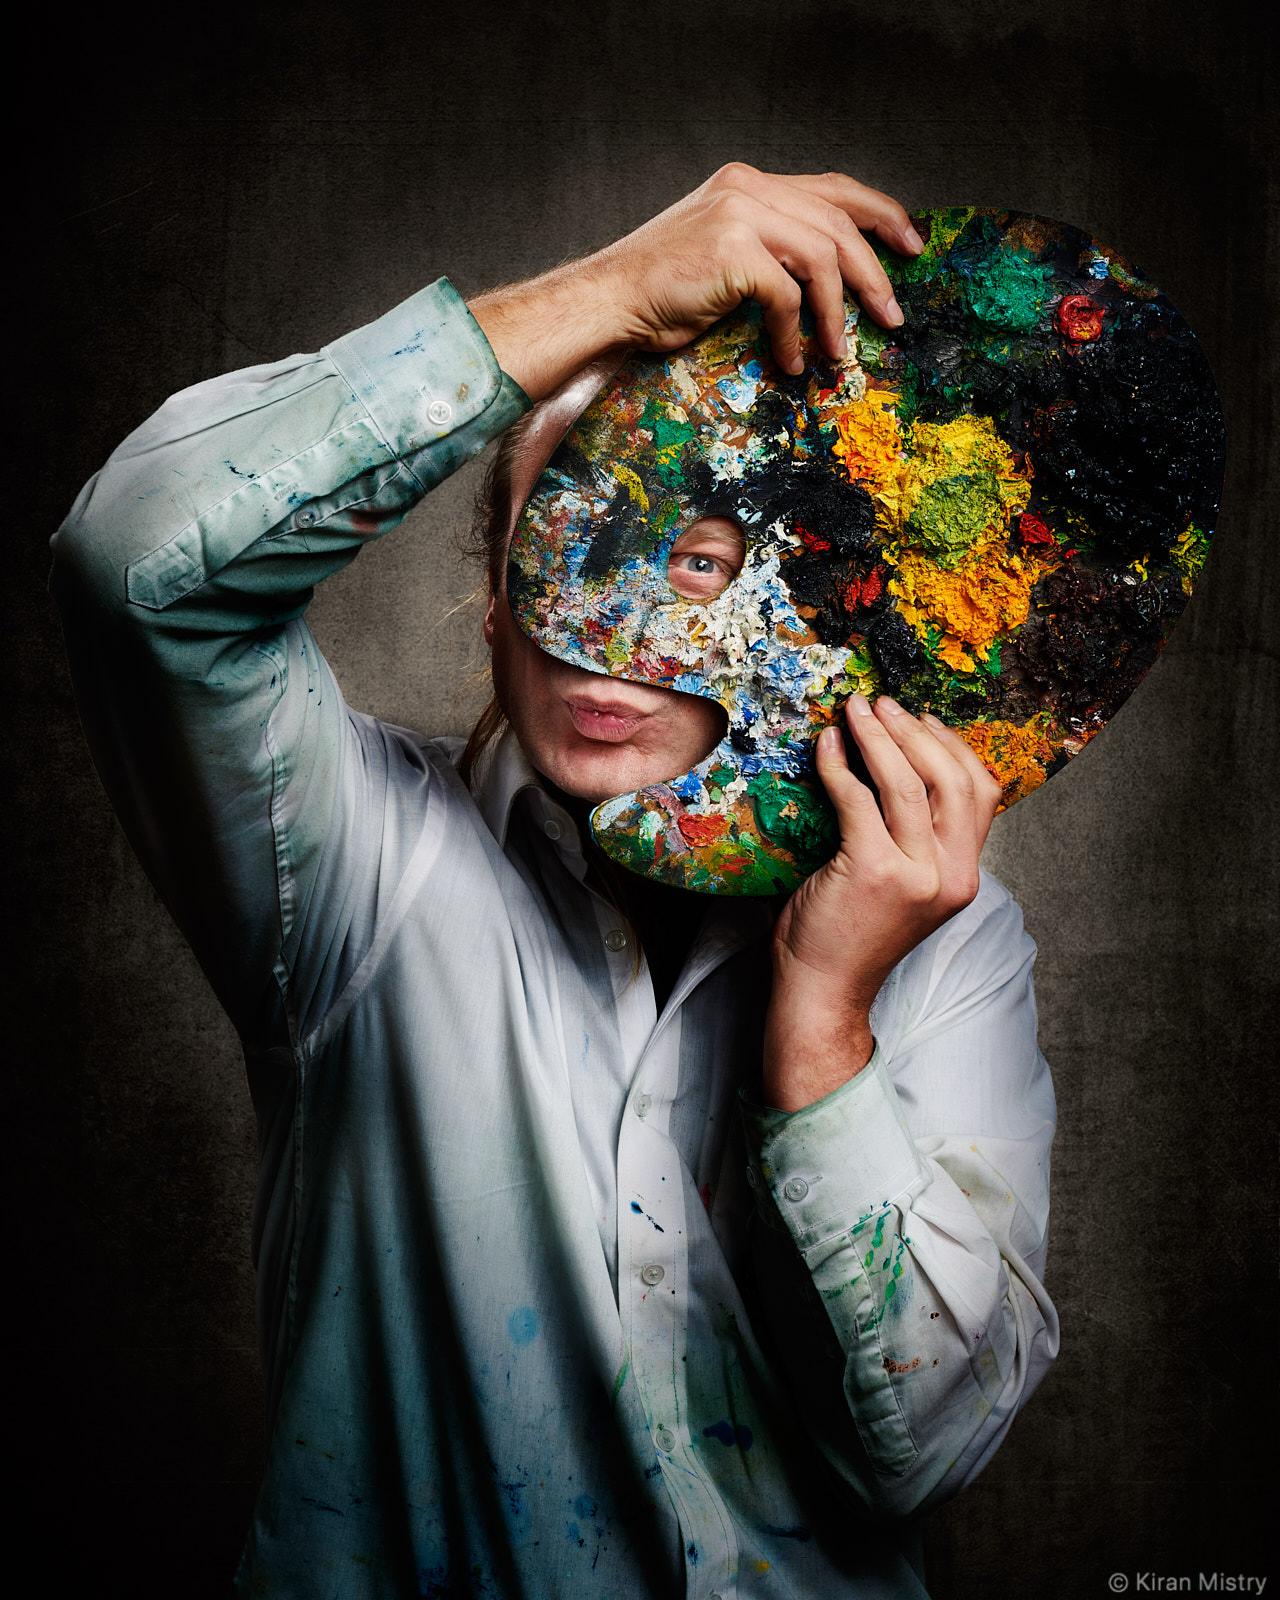 Artist Hugh Winterbottom